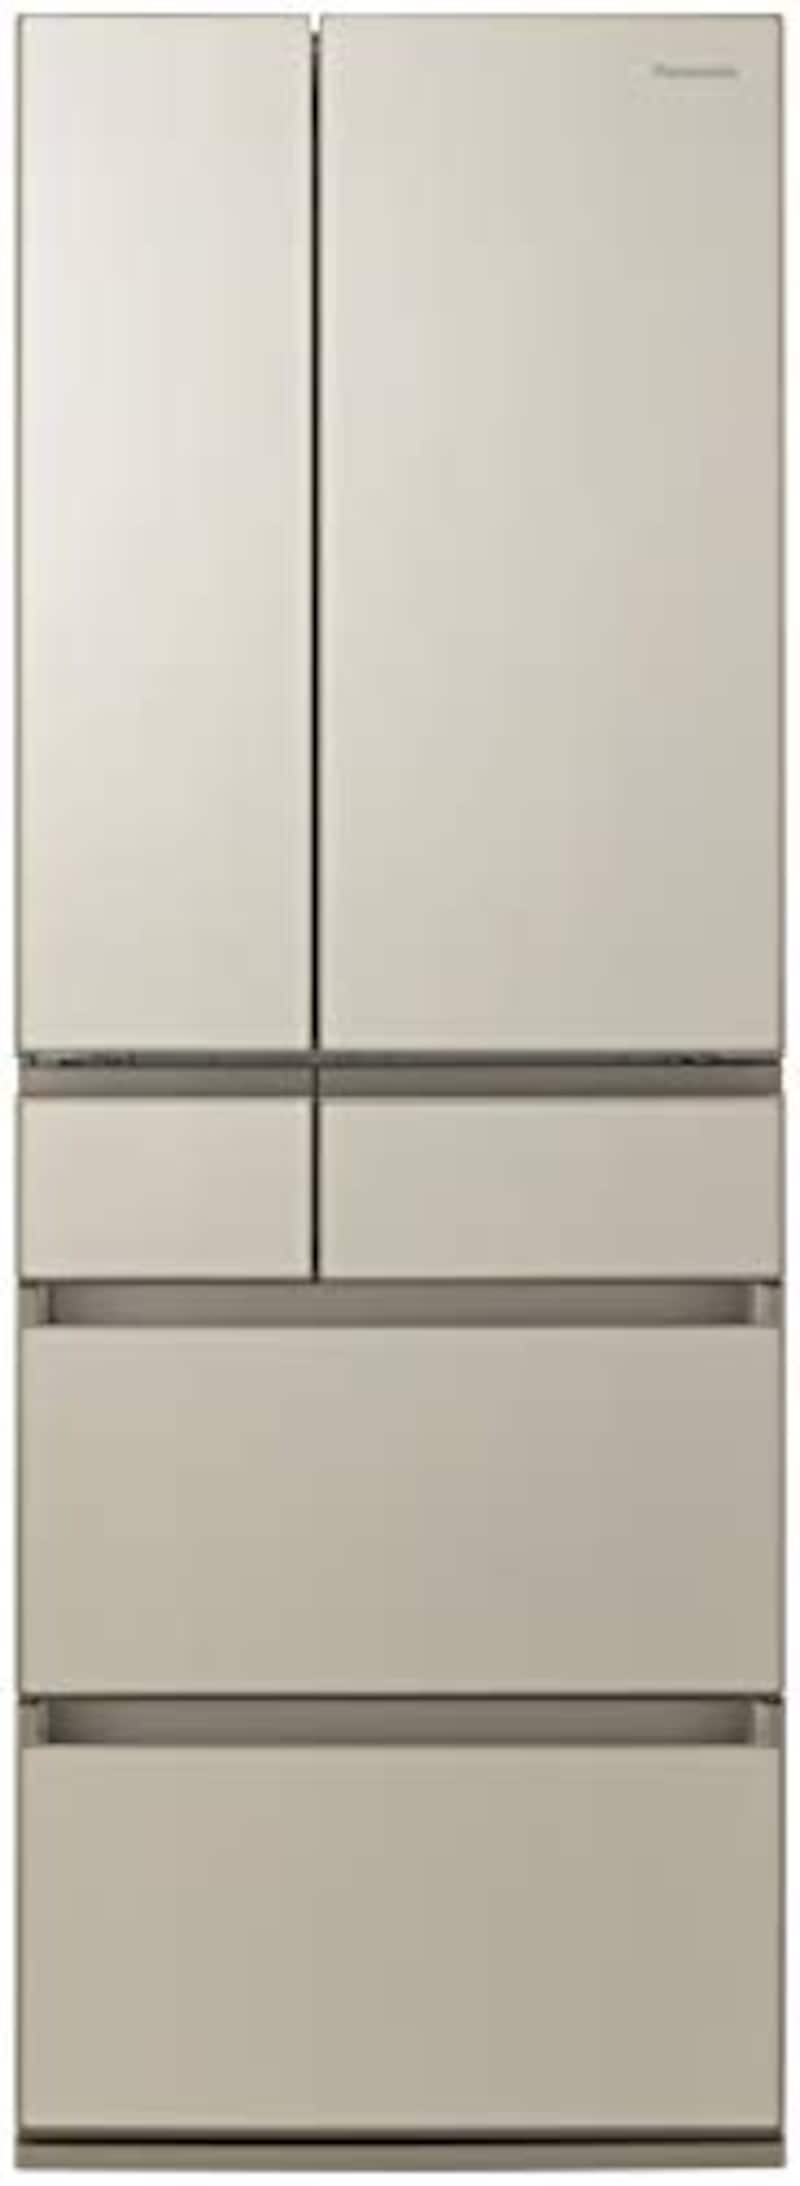 Panasonic(パナソニック),6ドア冷蔵庫 サテンゴールド, NR-F507PX-N